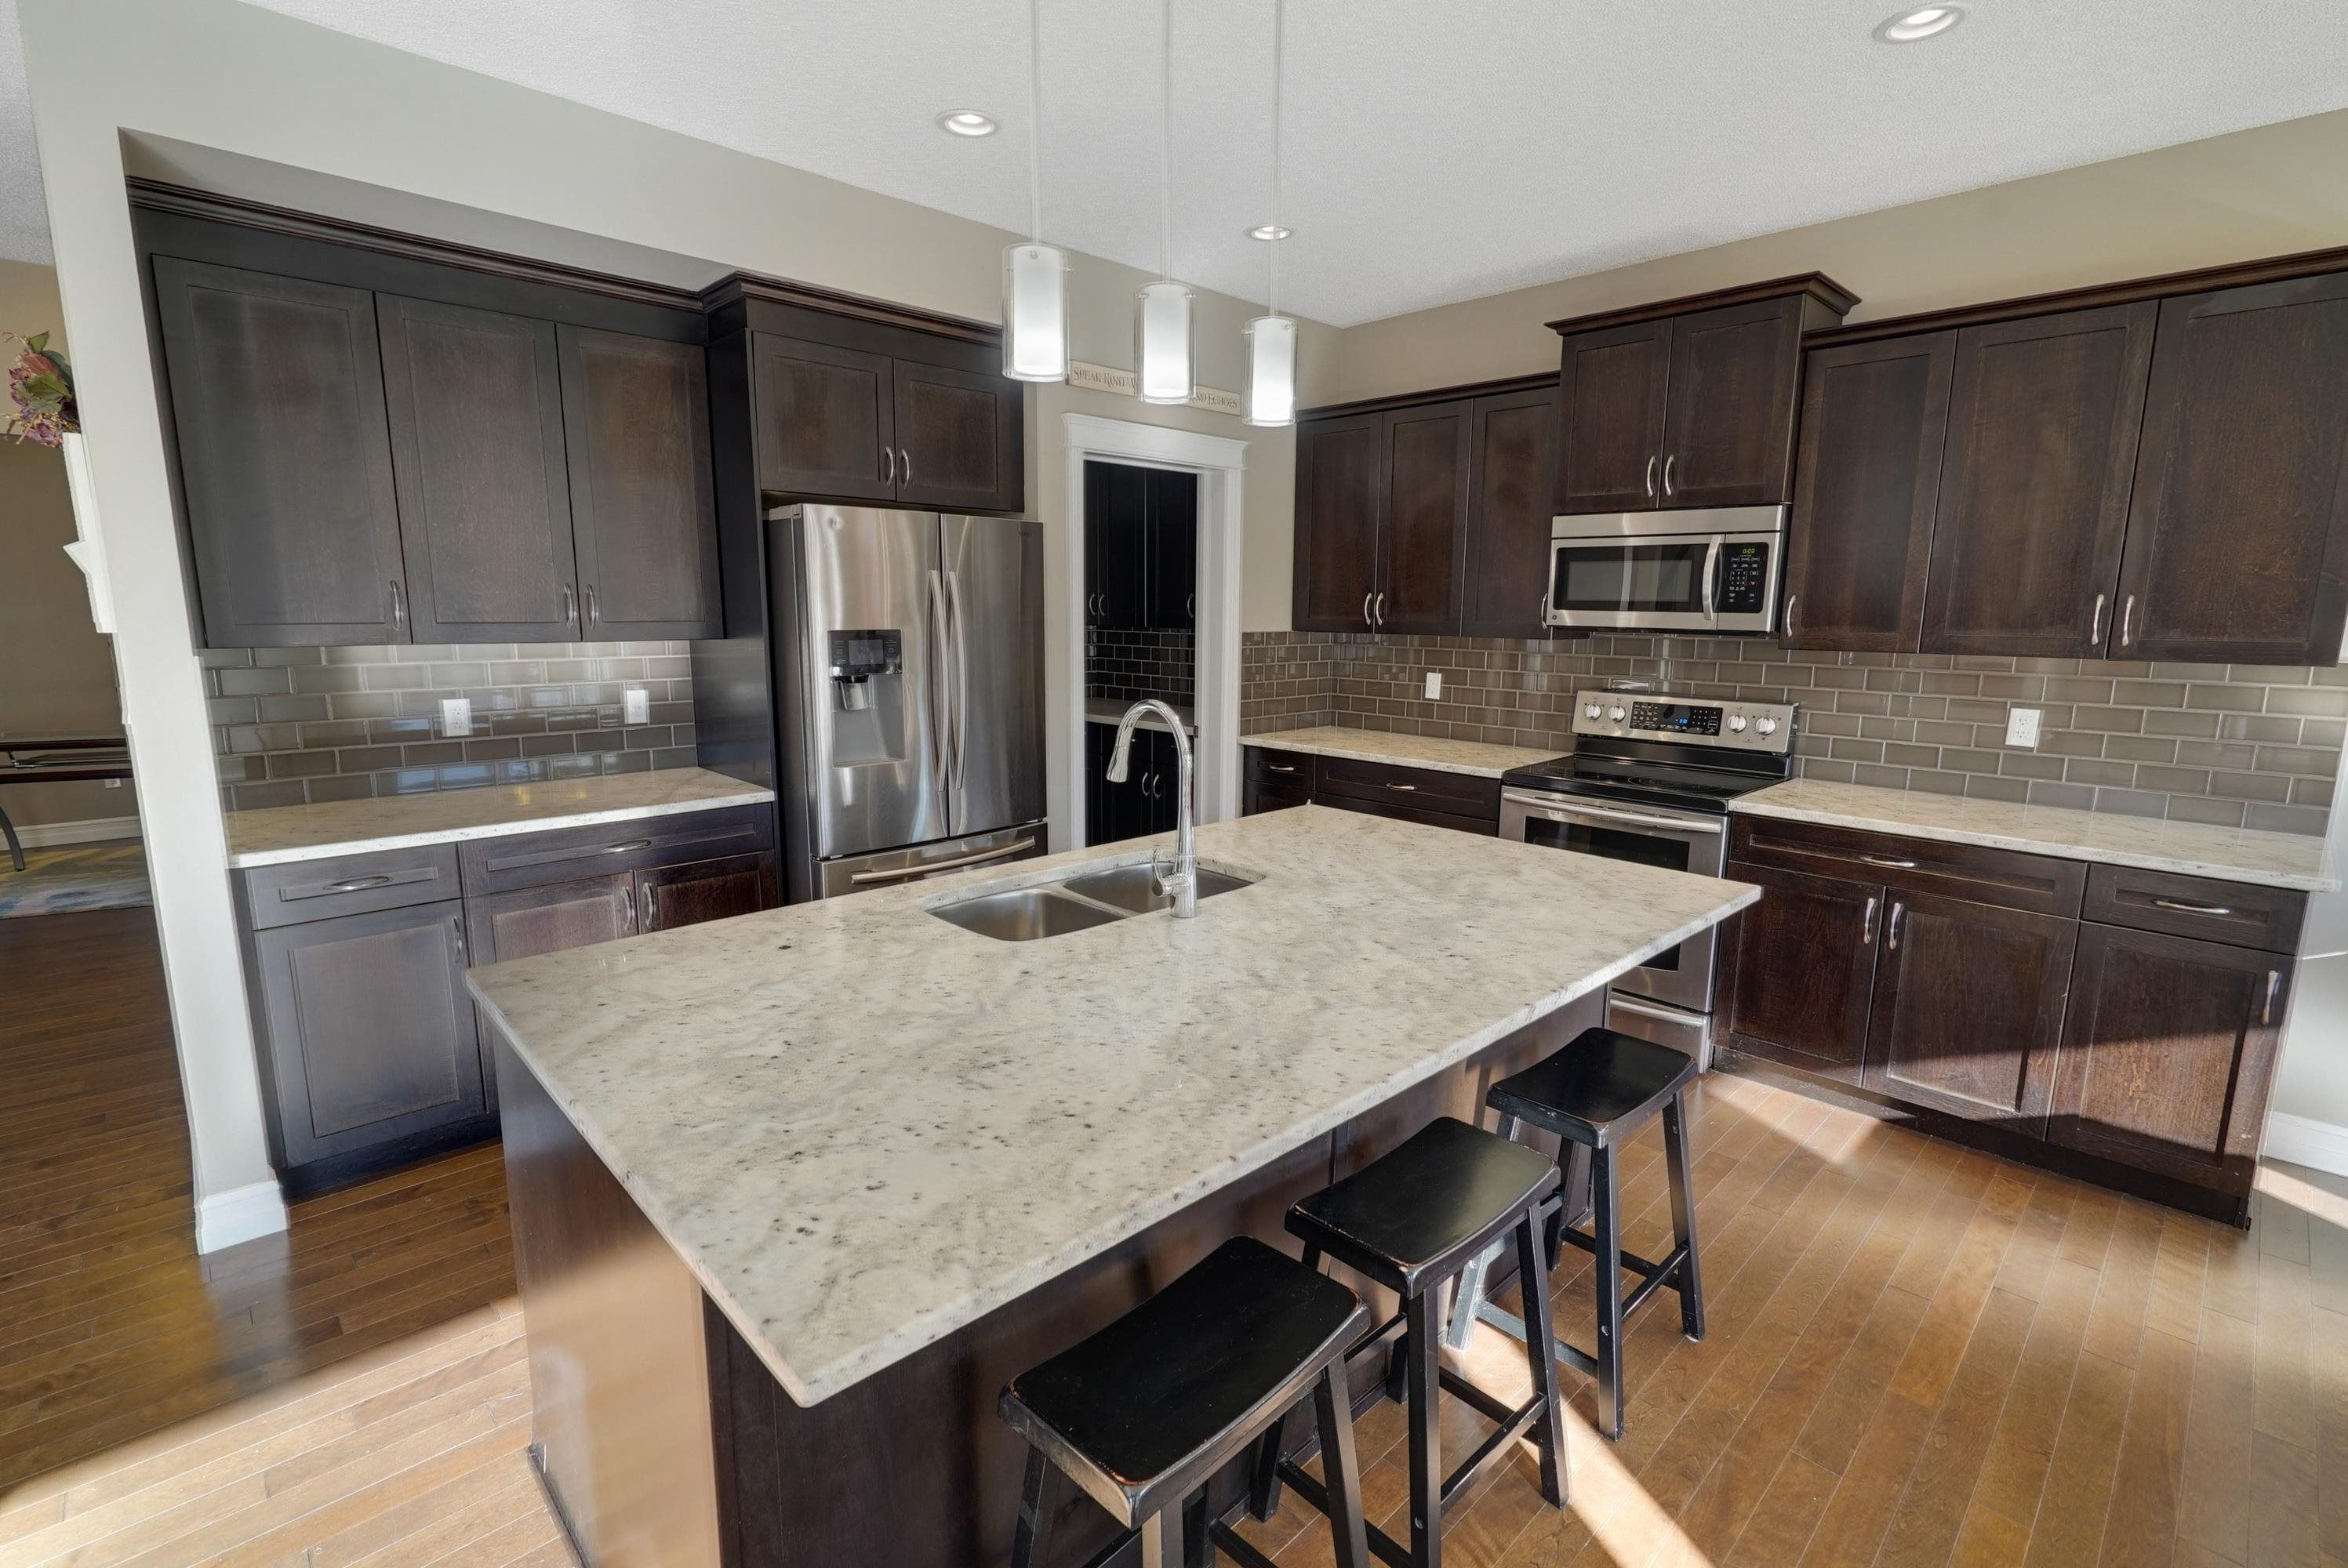 Main Photo: 3119 WINSPEAR Crescent in Edmonton: Zone 53 House for sale : MLS®# E4266407